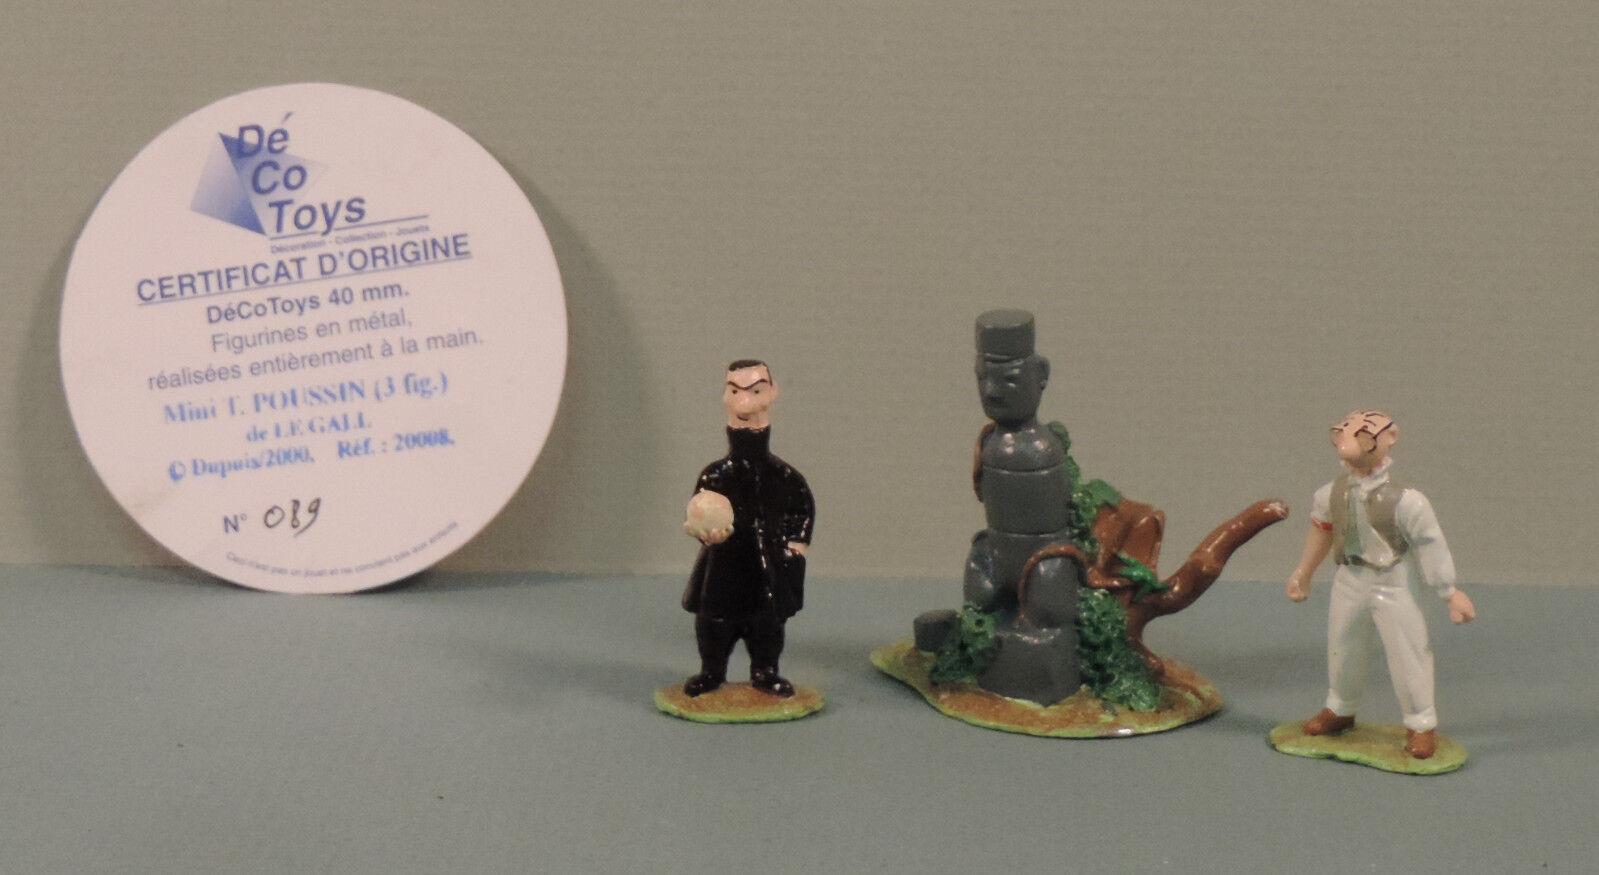 Theodore Poussin et Mr Novembre mini statuette metal Decotoys 20008 numerede